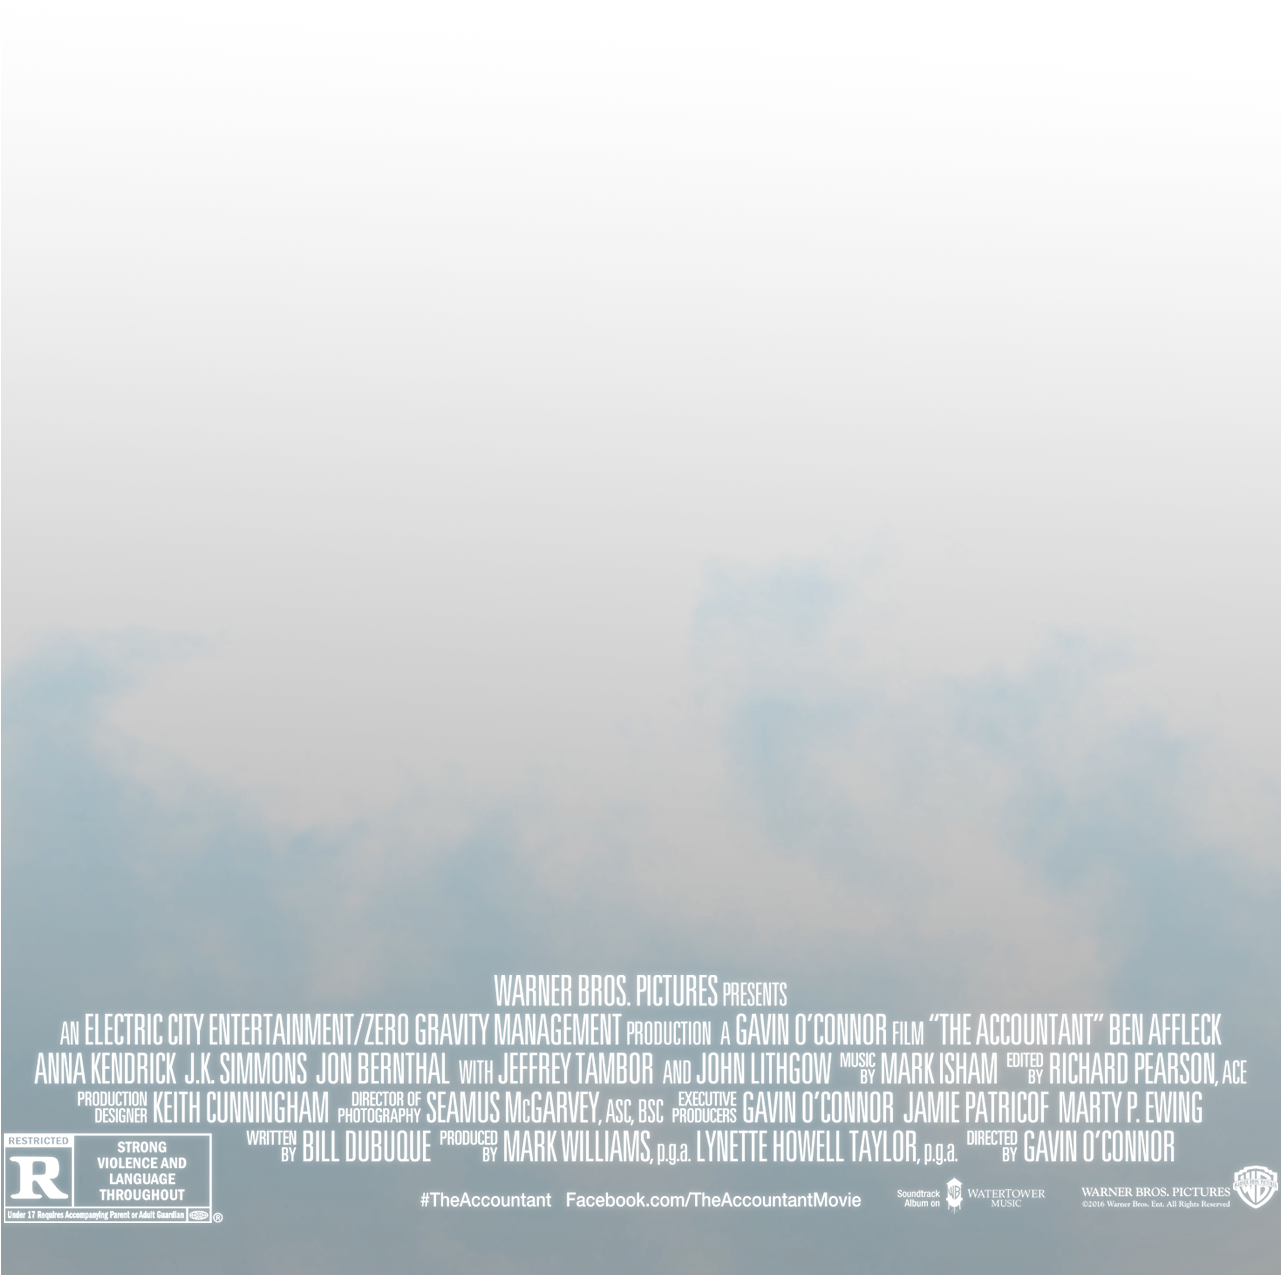 HD Movie Poster Text Png,picsartallpng.